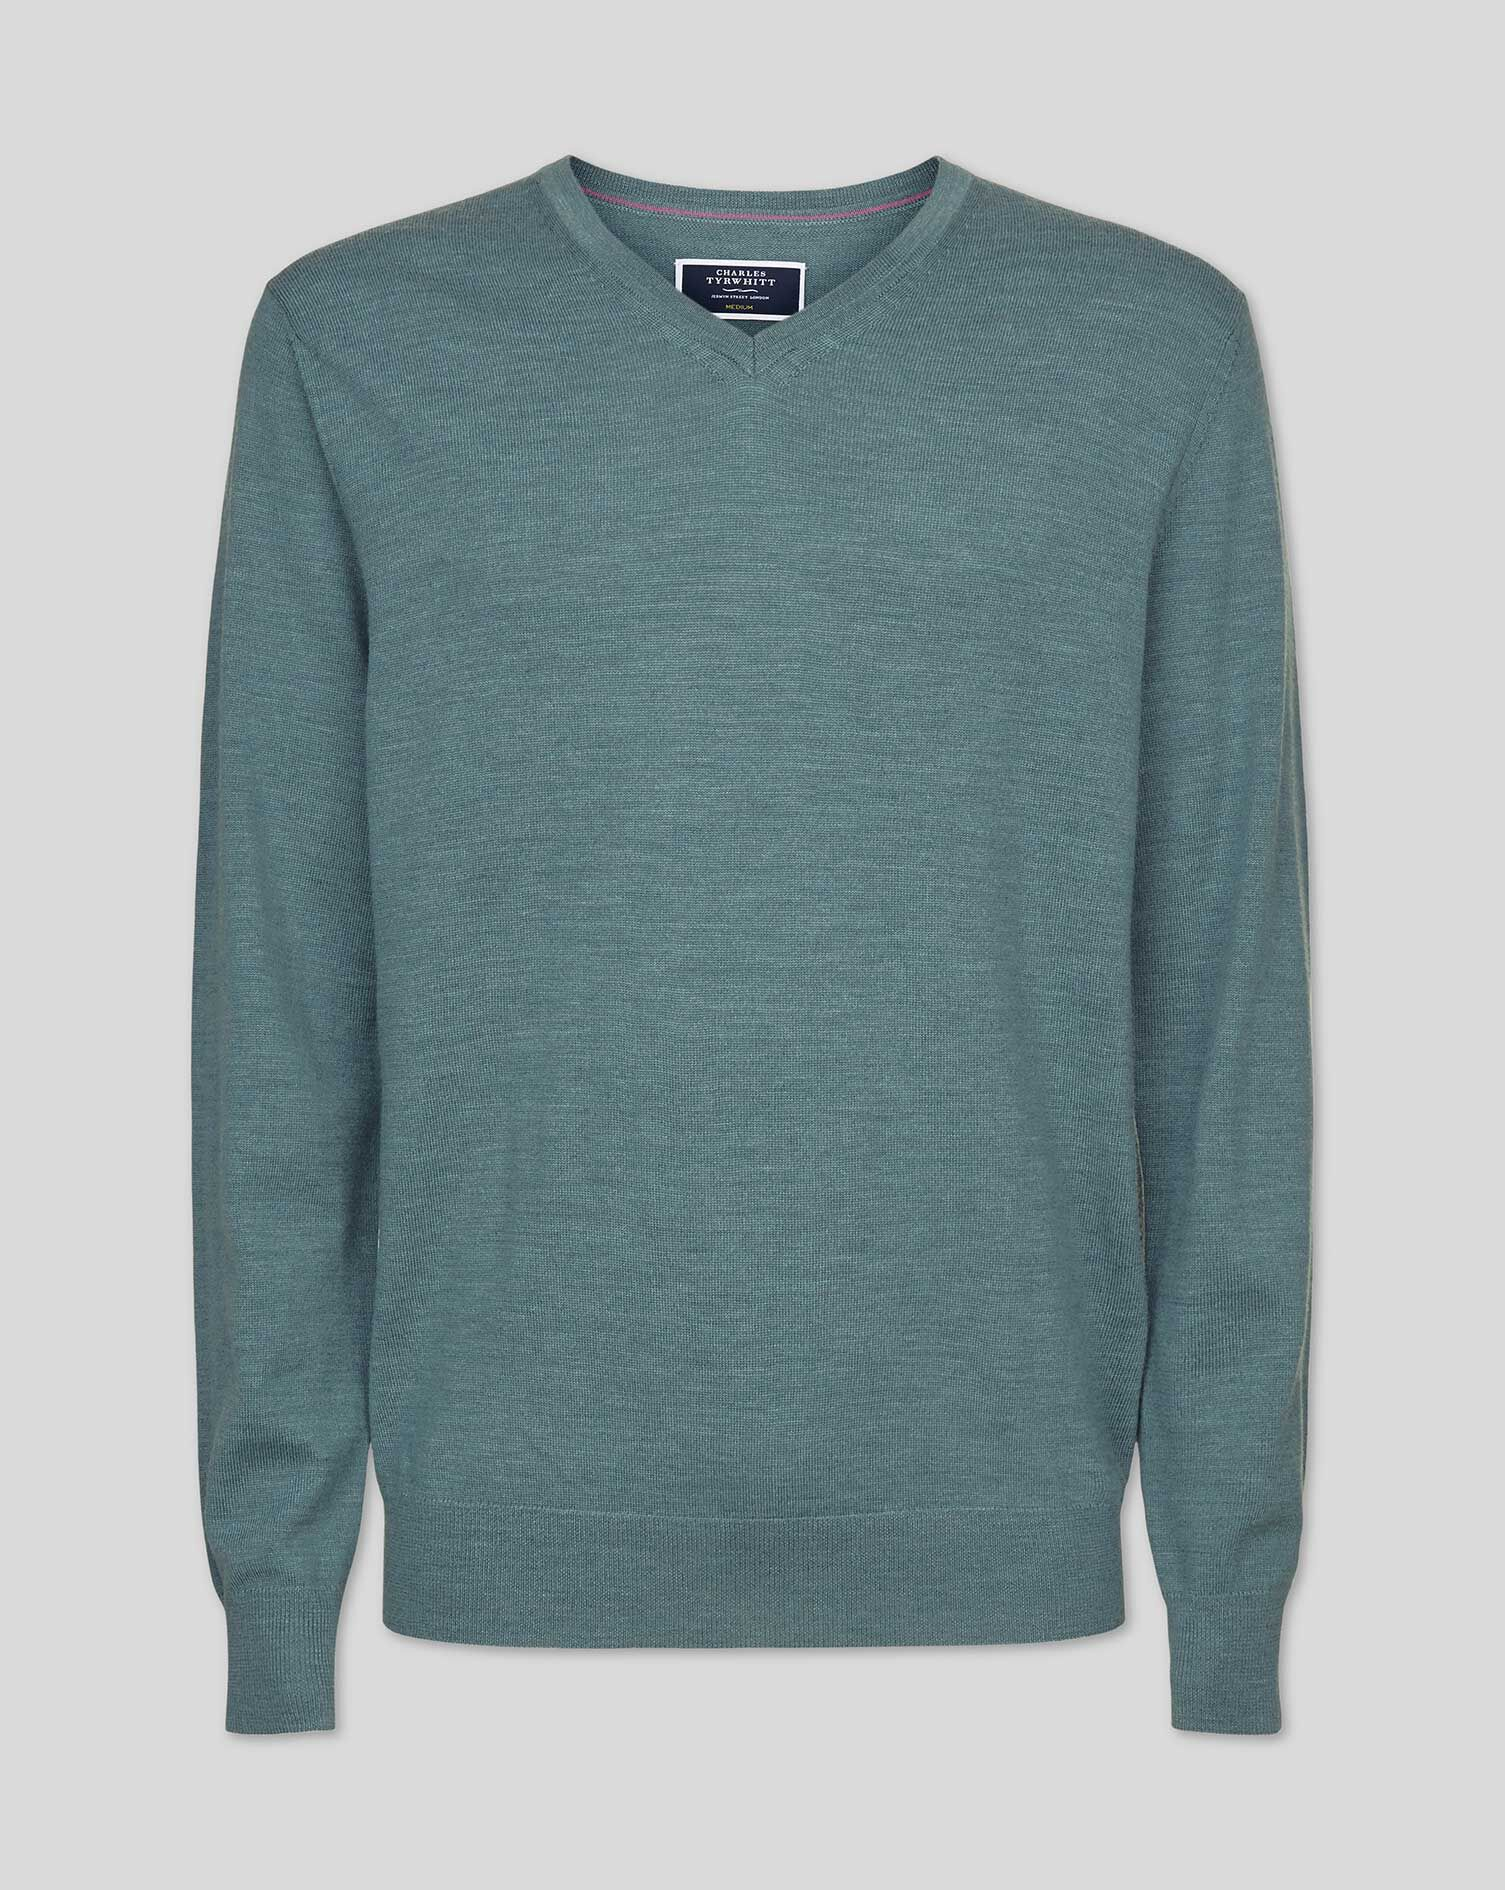 Men/'s Plain Jumpers V-Neck for Business Office Knitwear Navy Dark Blue